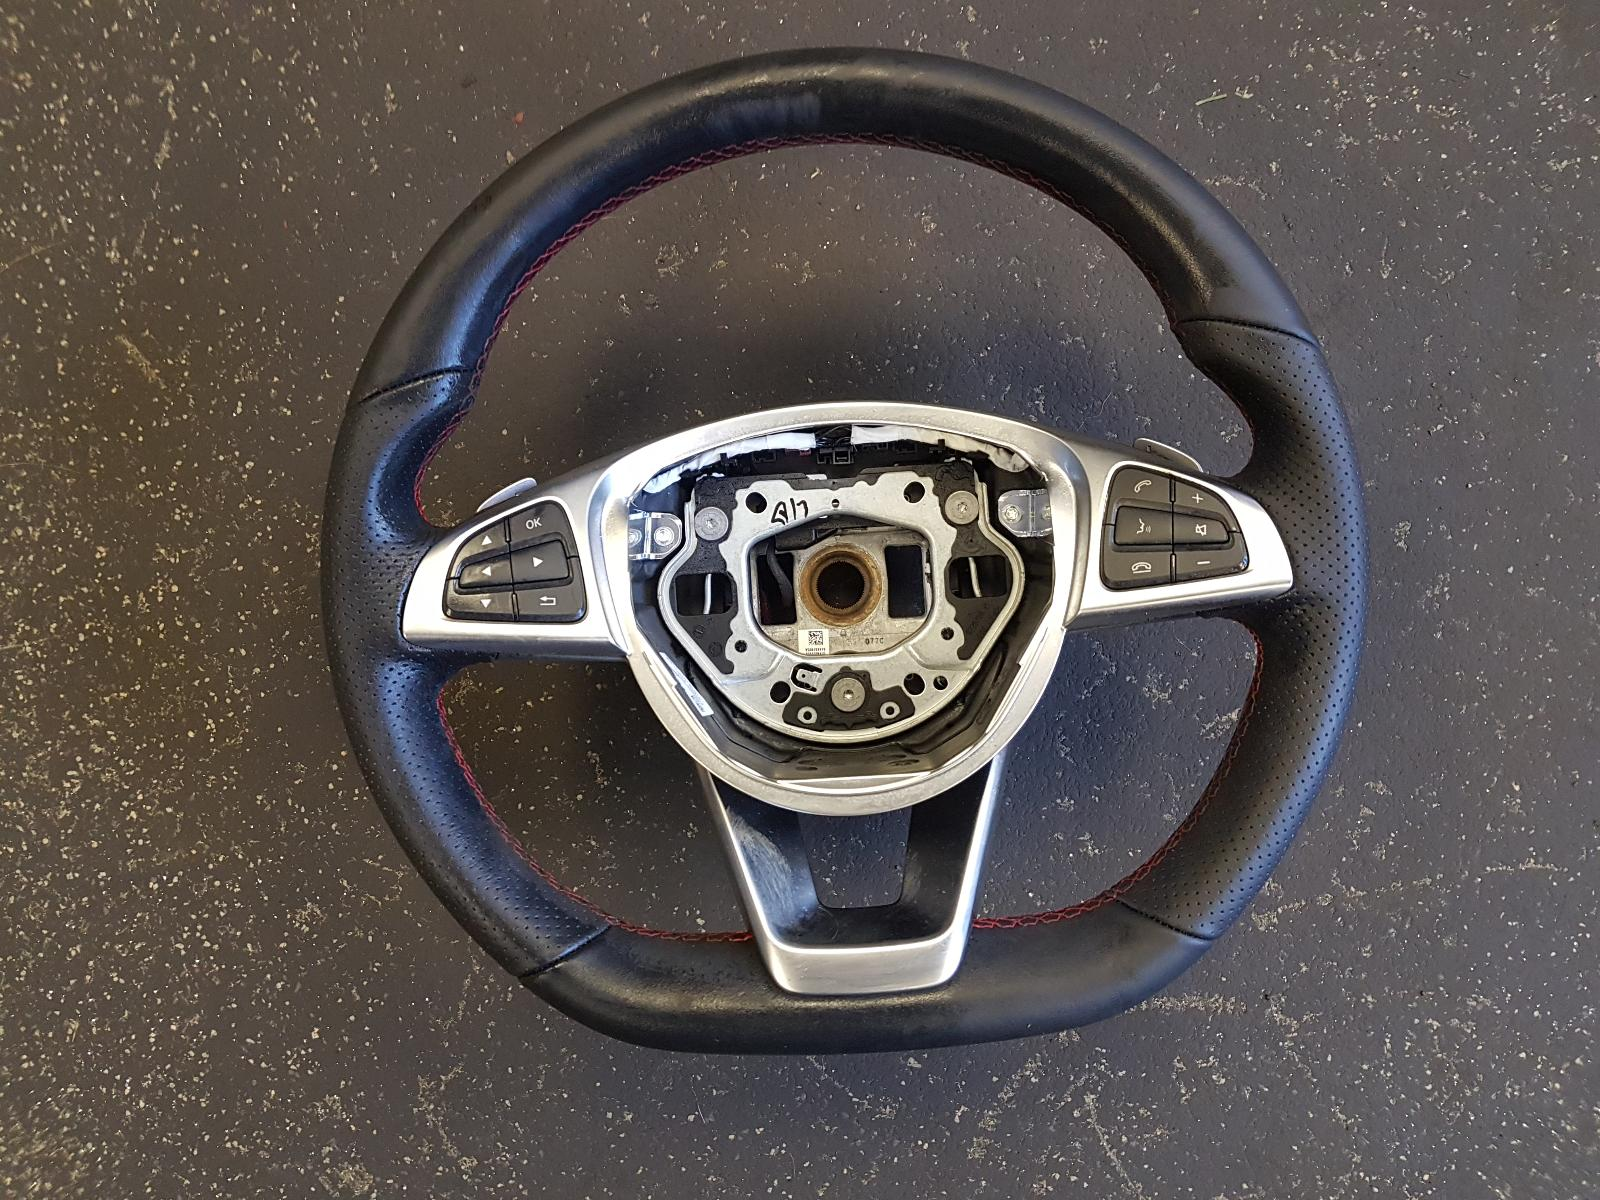 View Auto part Steering Wheel Mercedes Gla Class 2019